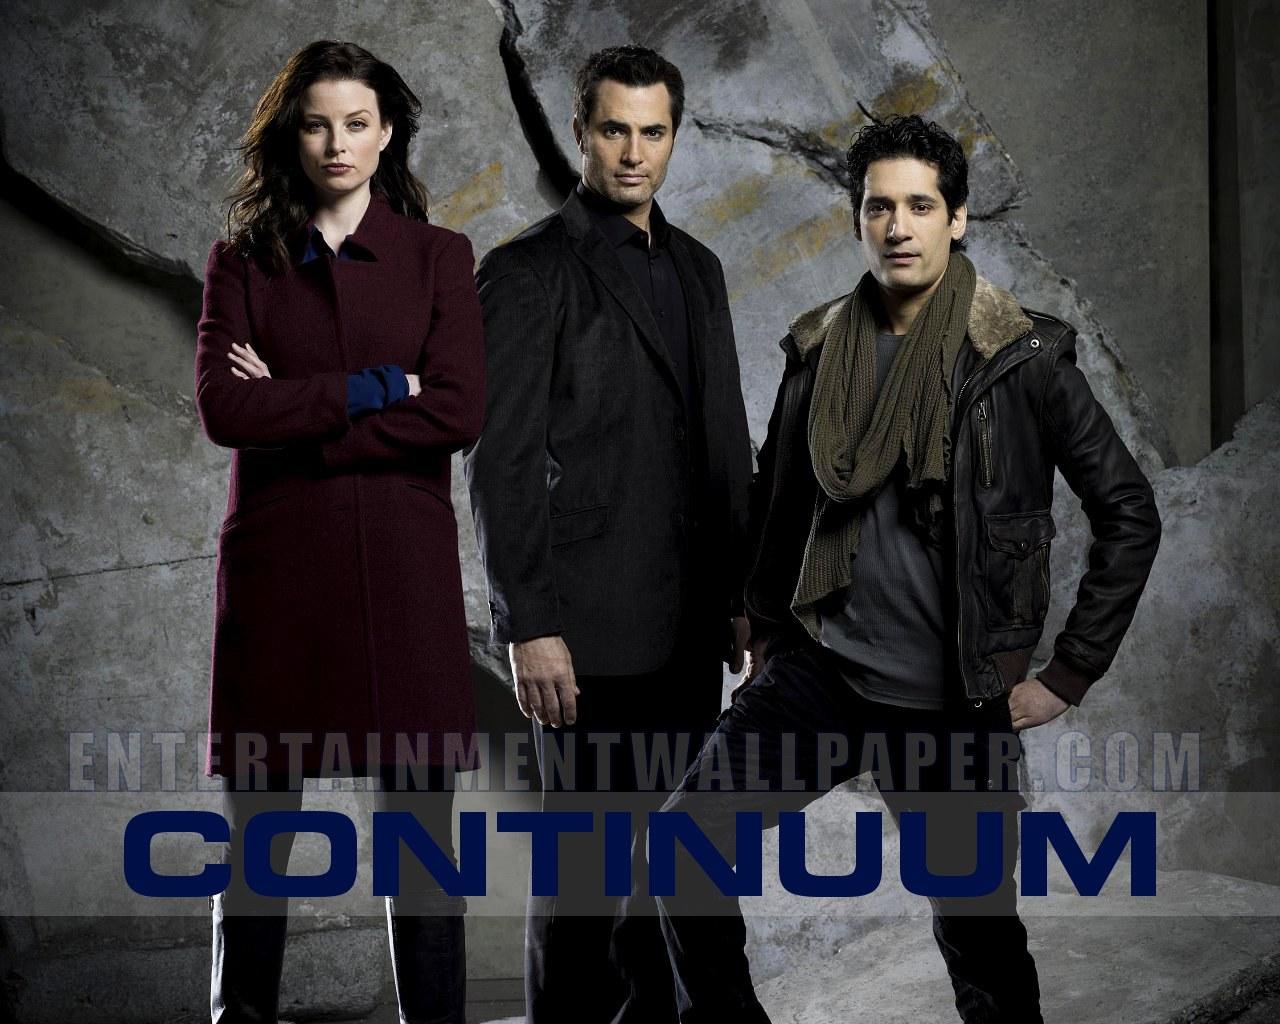 tv show continuum wallpaper 20041091 size 1280x1024 more continuum 1280x1024